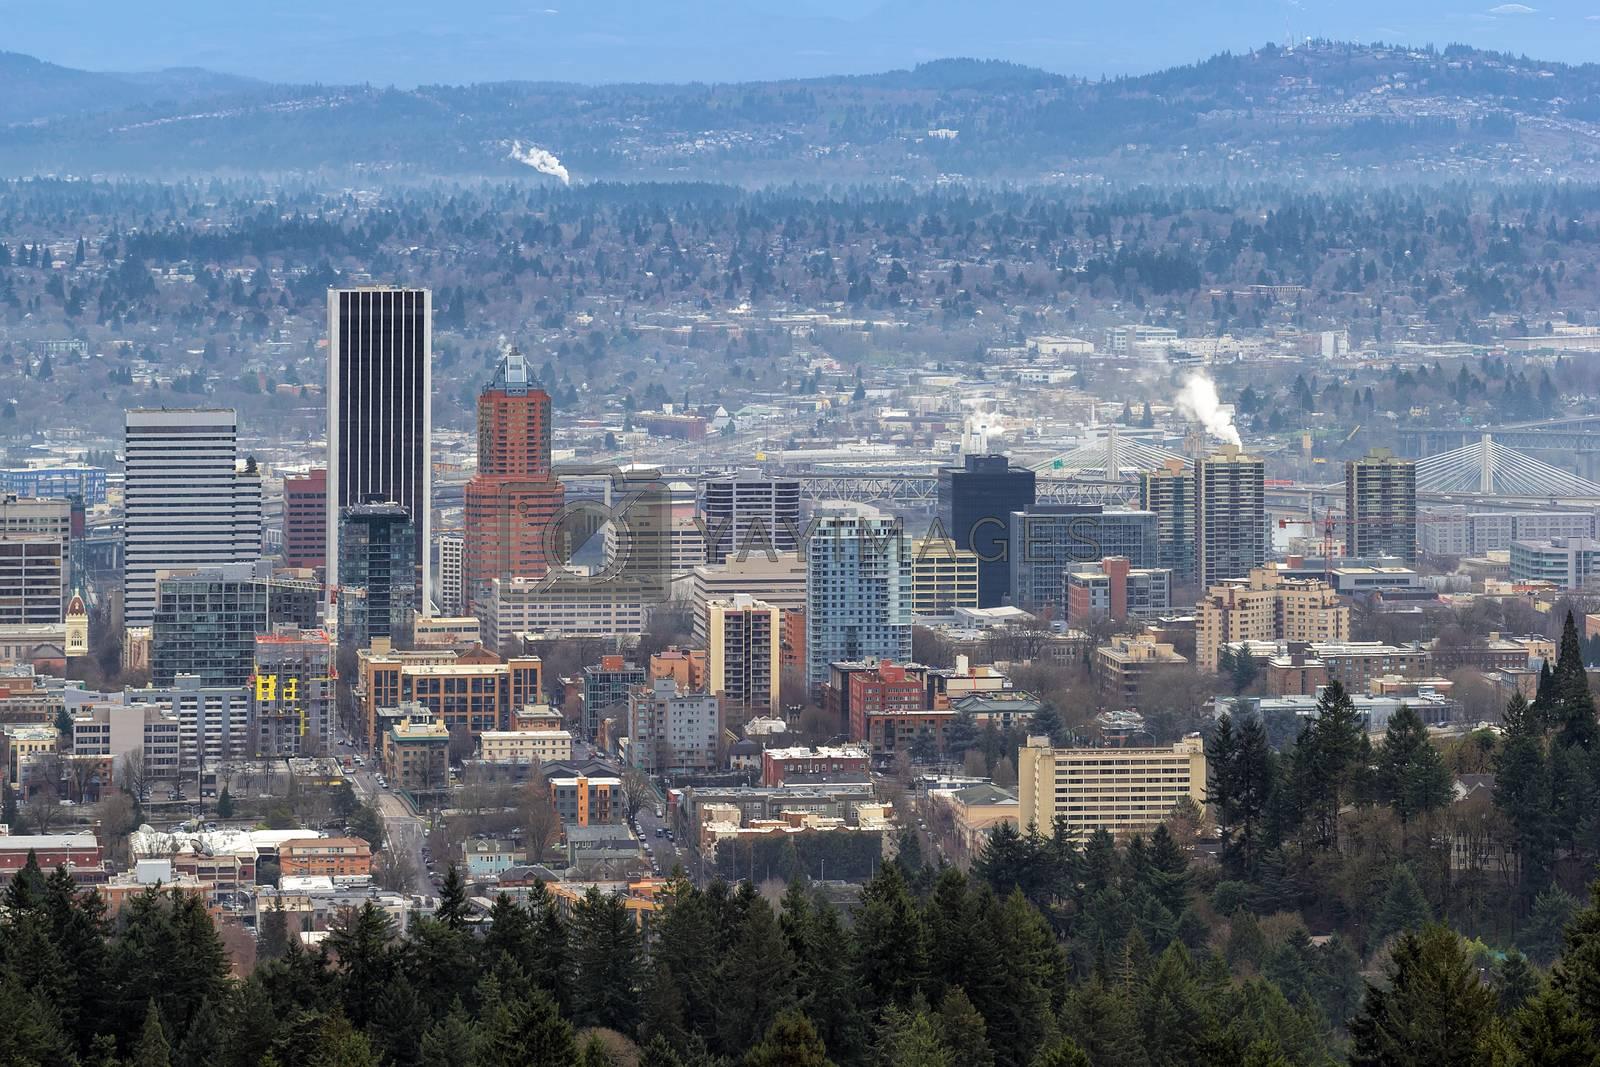 Portland Oregon Cityscape with Tilikum Crossing and Marquam Bridge